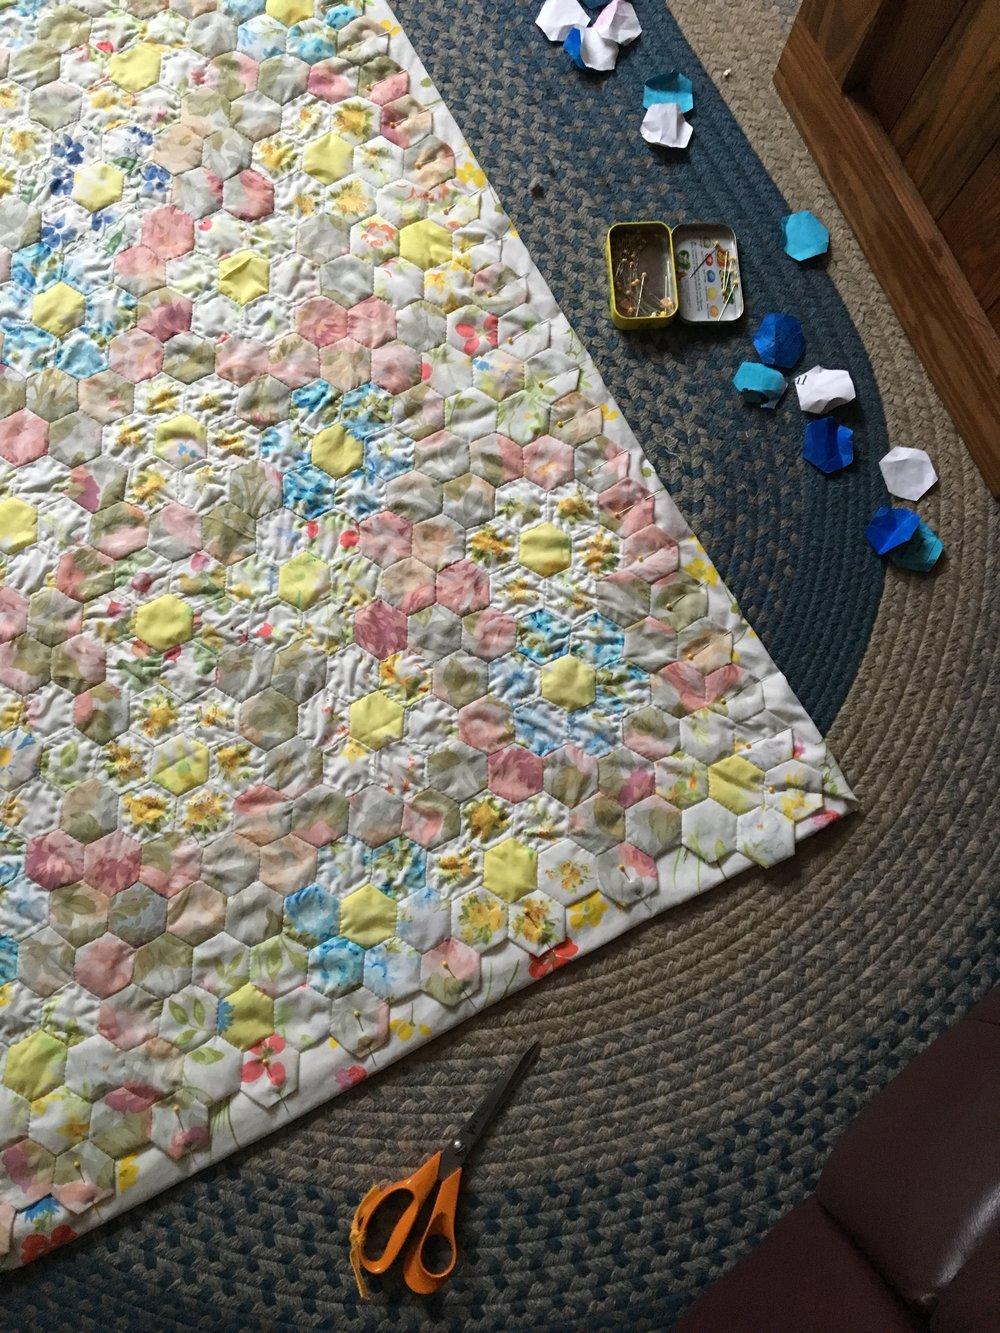 Sewing in Brattleboro, VT